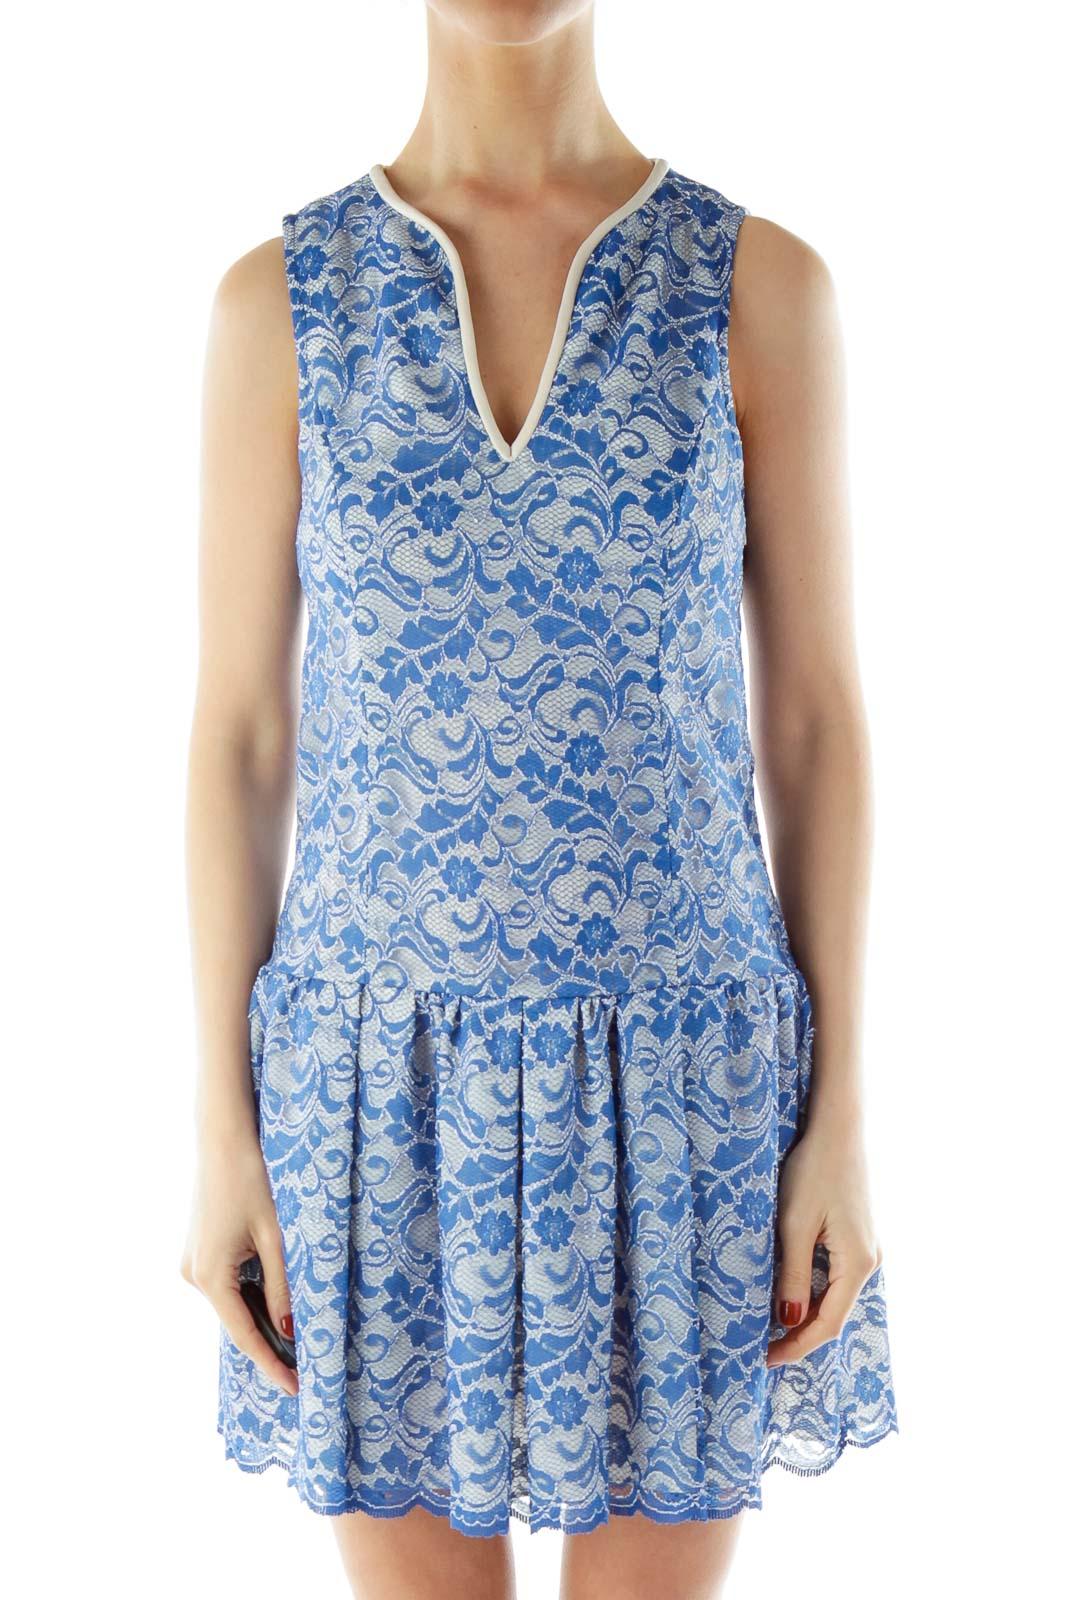 Blue Lace Sleeveless V-Neck Day Dress Front